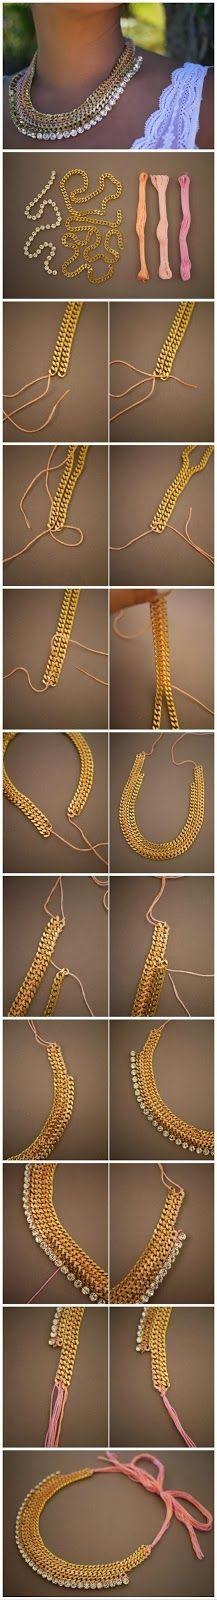 DIY Golden Necklace